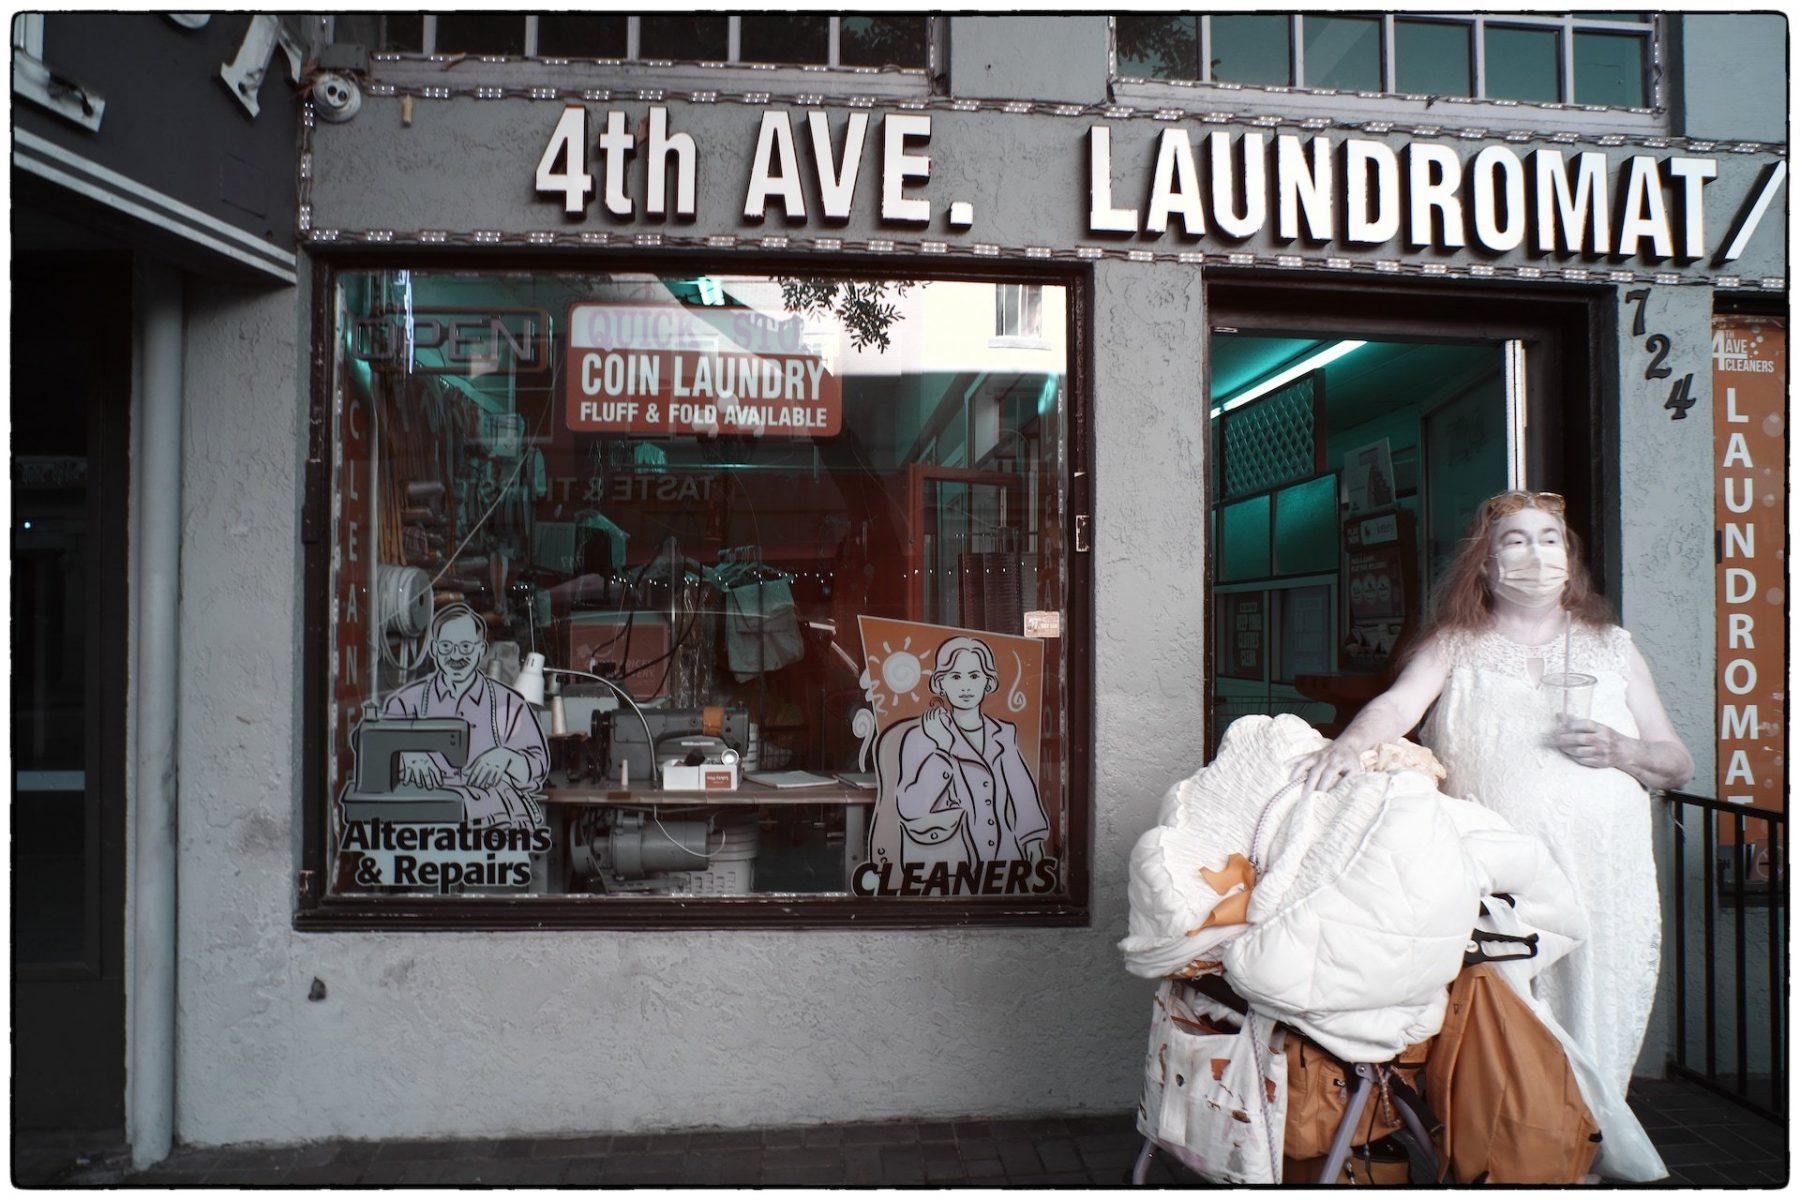 Sally Bucko - 4th Ave Laundromat